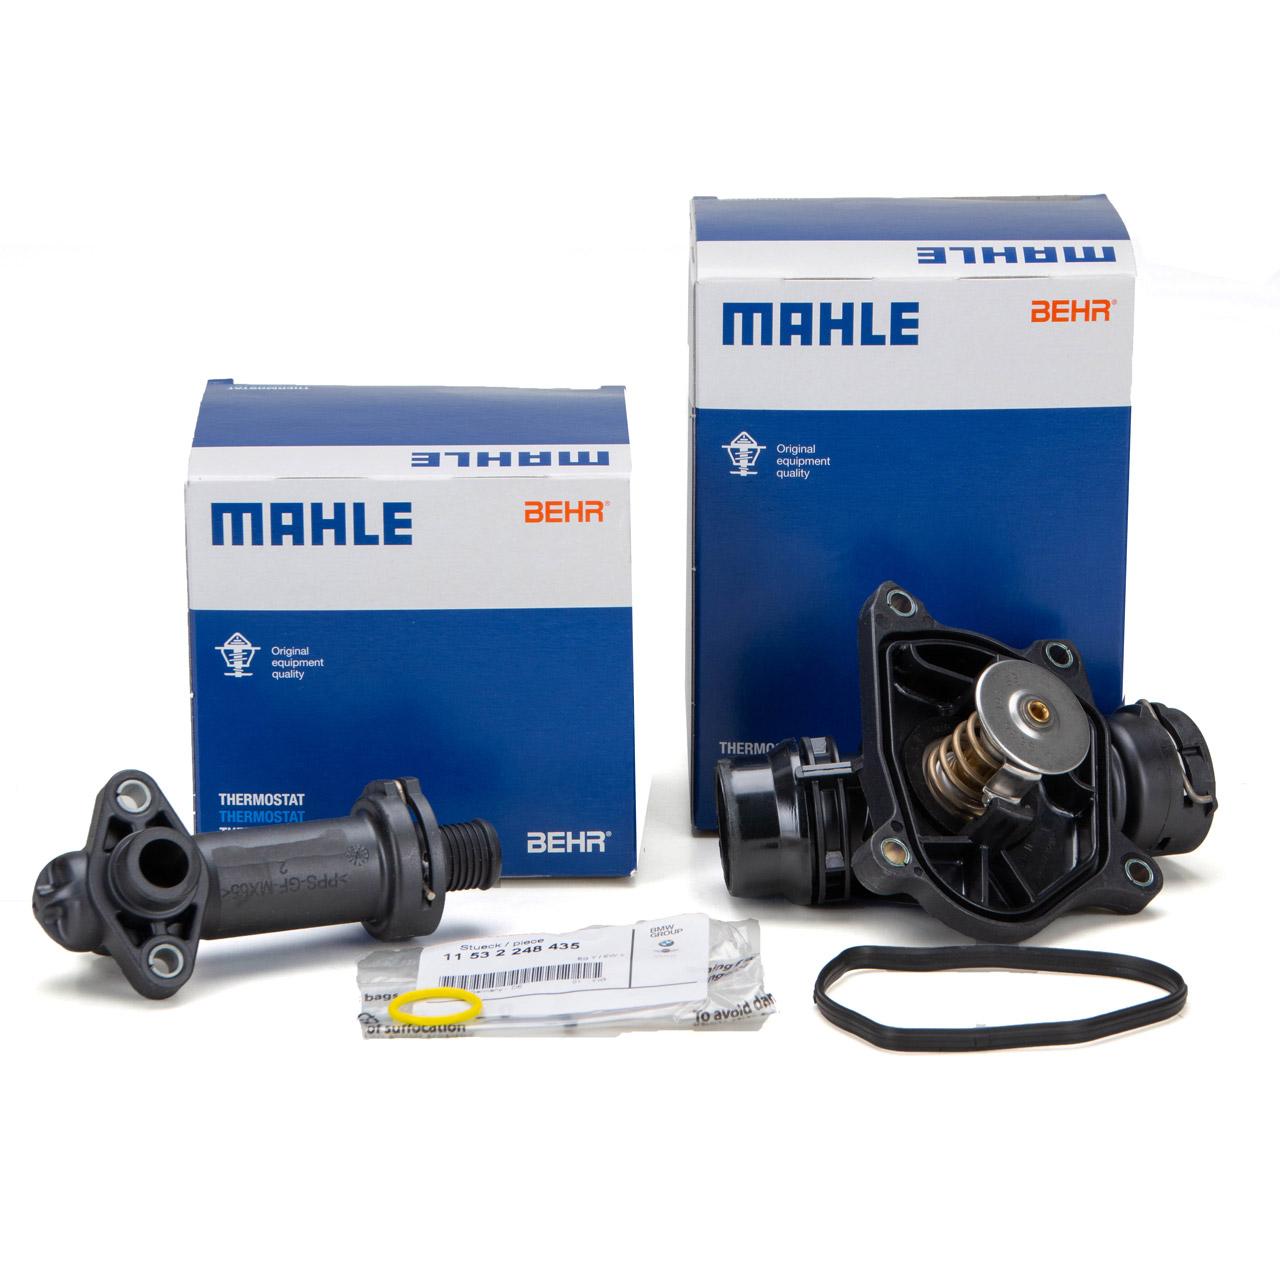 BEHR / MAHLE Thermostat + AGR Thermostat + Dichtung BMW E46 E90-E92 M47 M57